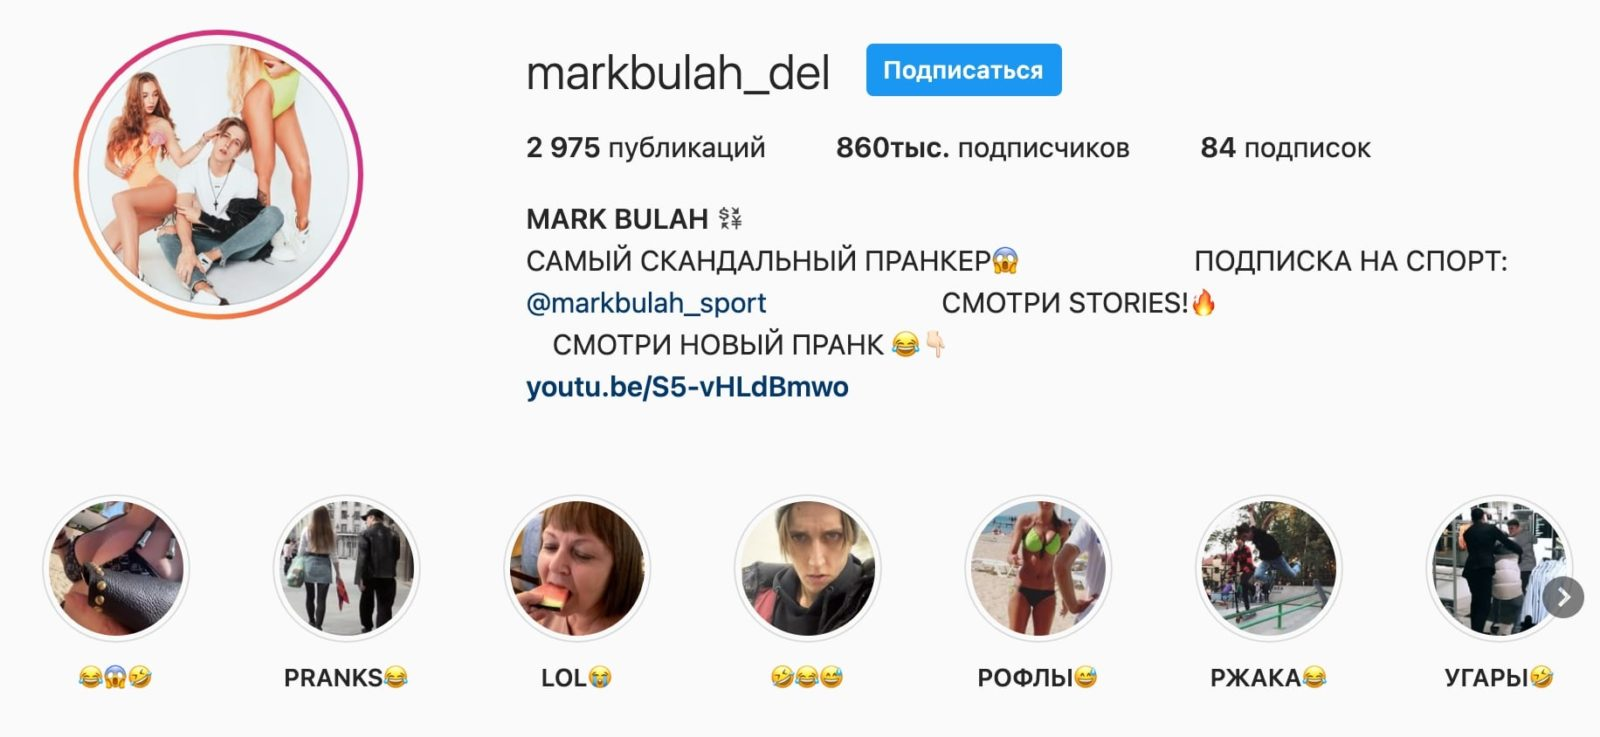 Инстаграм создателя проекта Mark Bulah Bet (Марк Булах)